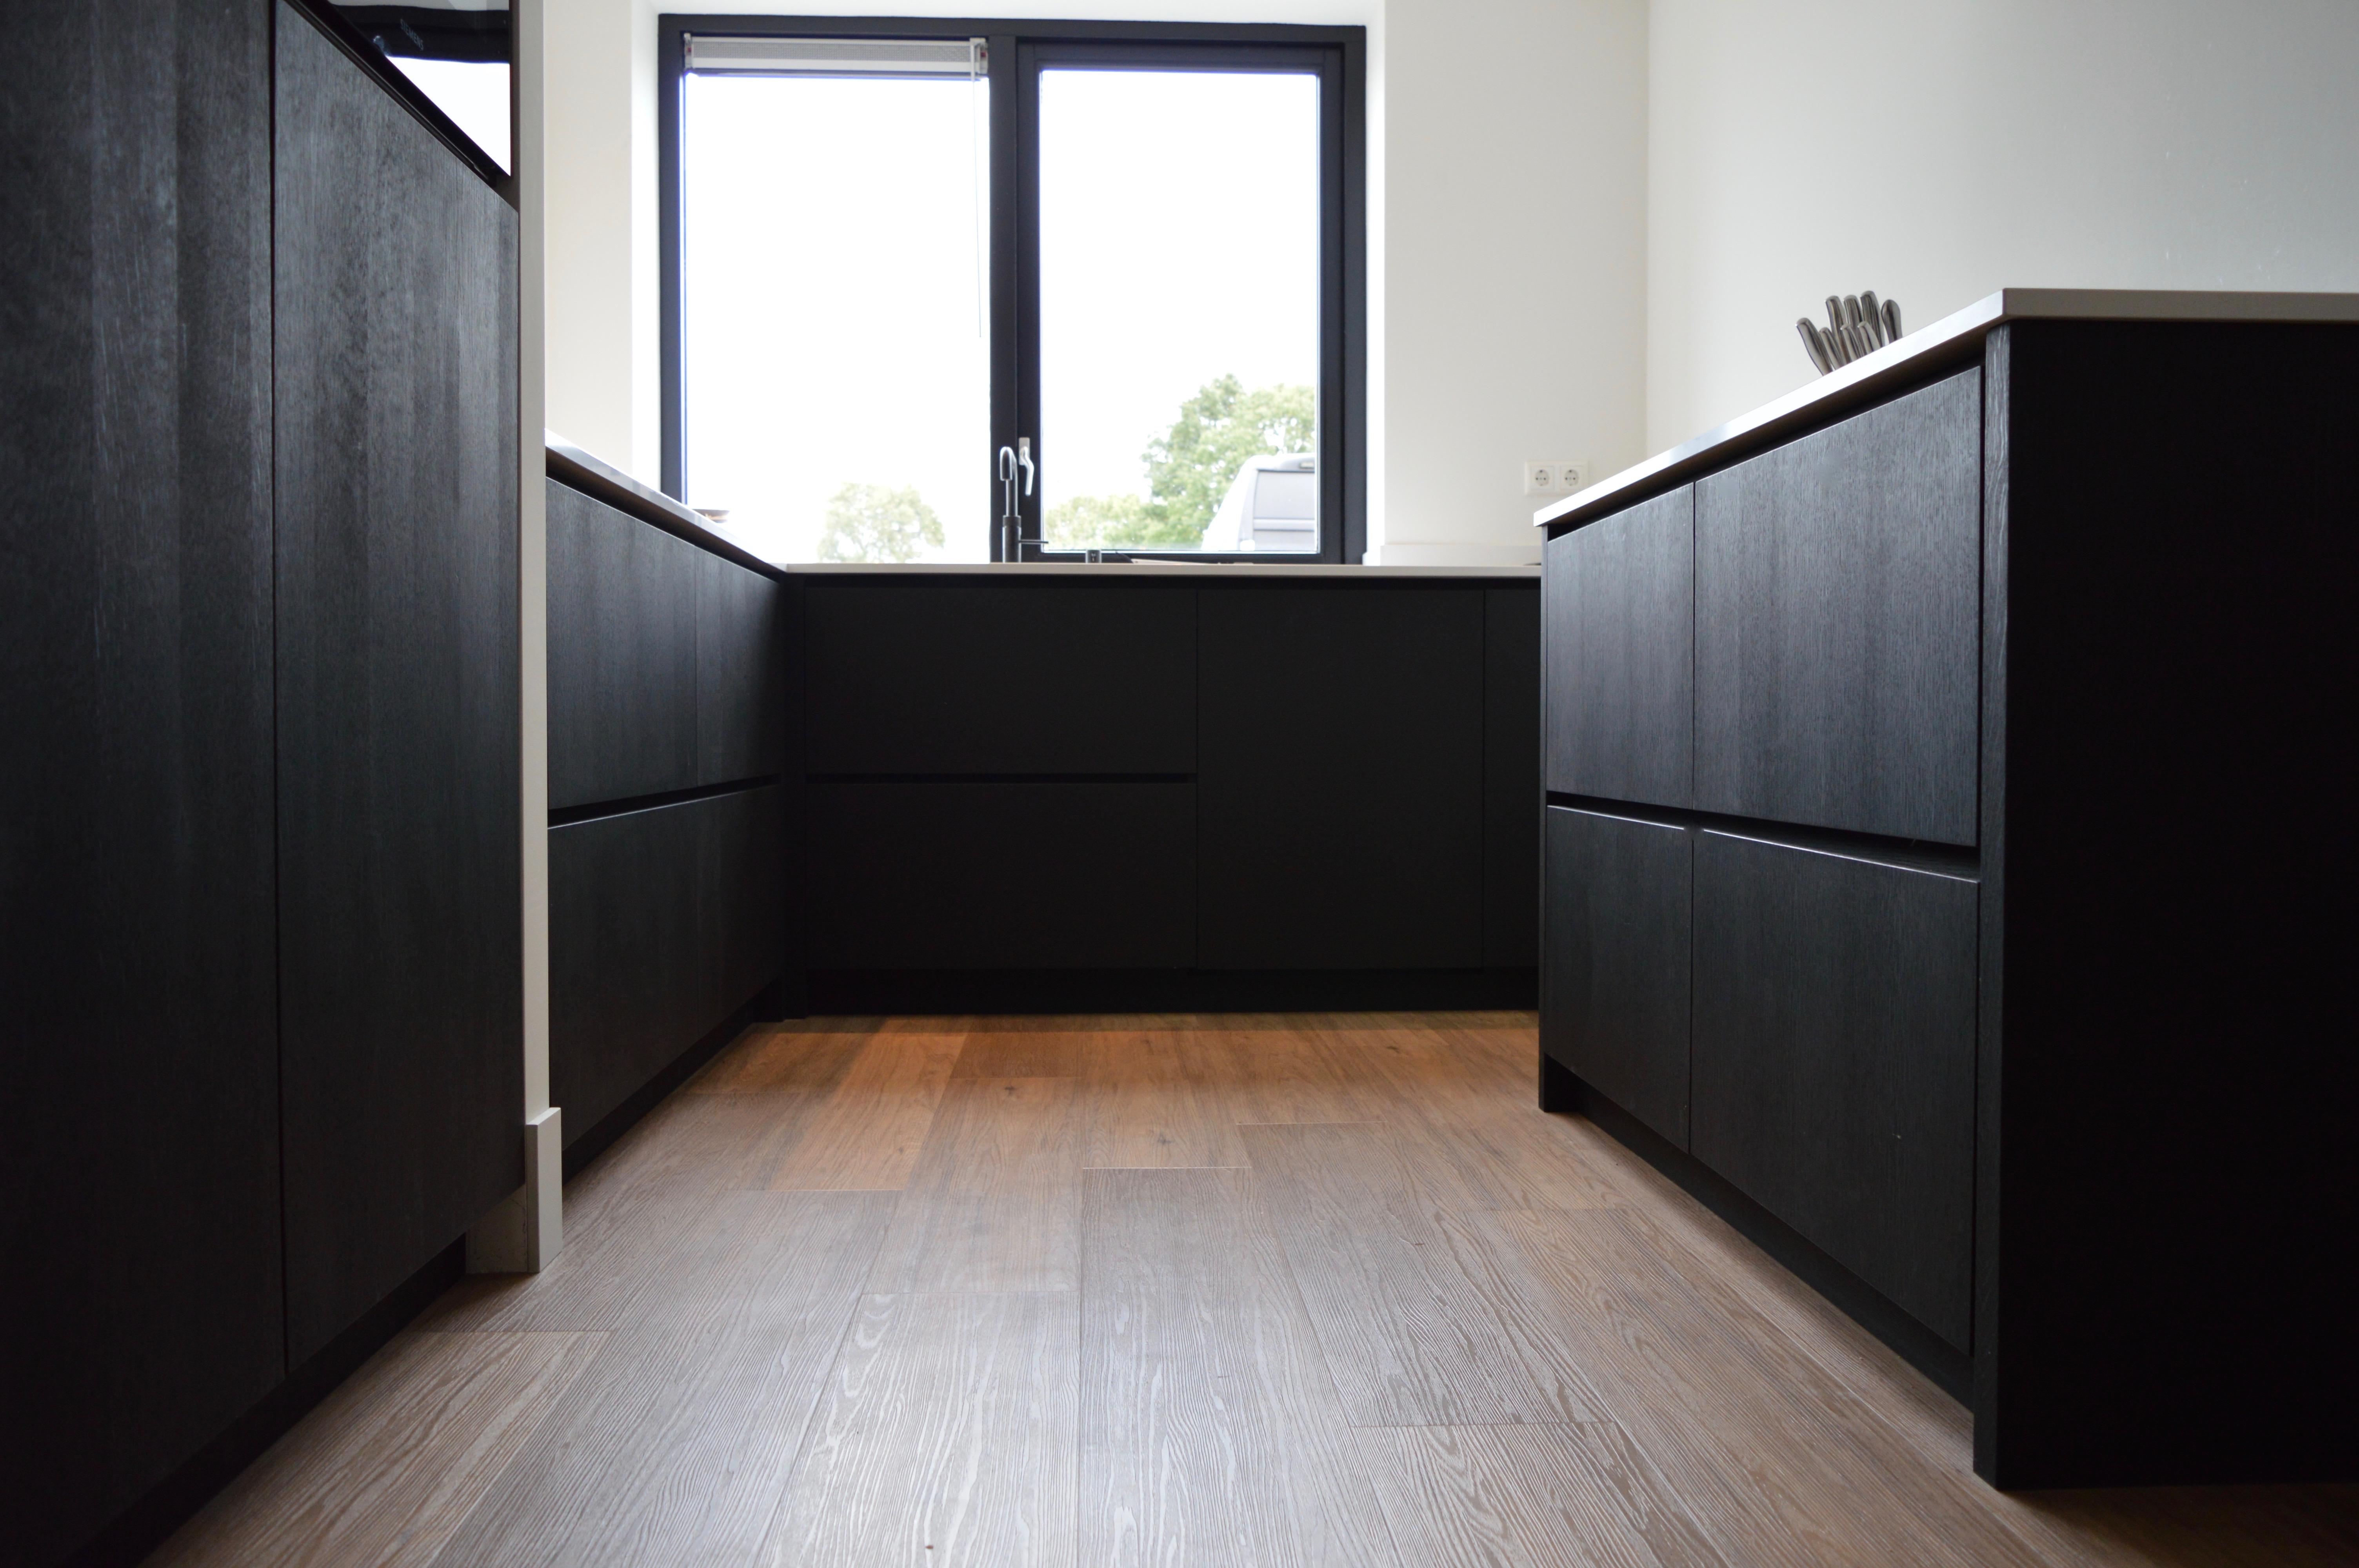 Keuken Eiken Zwart : Zwart eiken keuken jeroen bouw